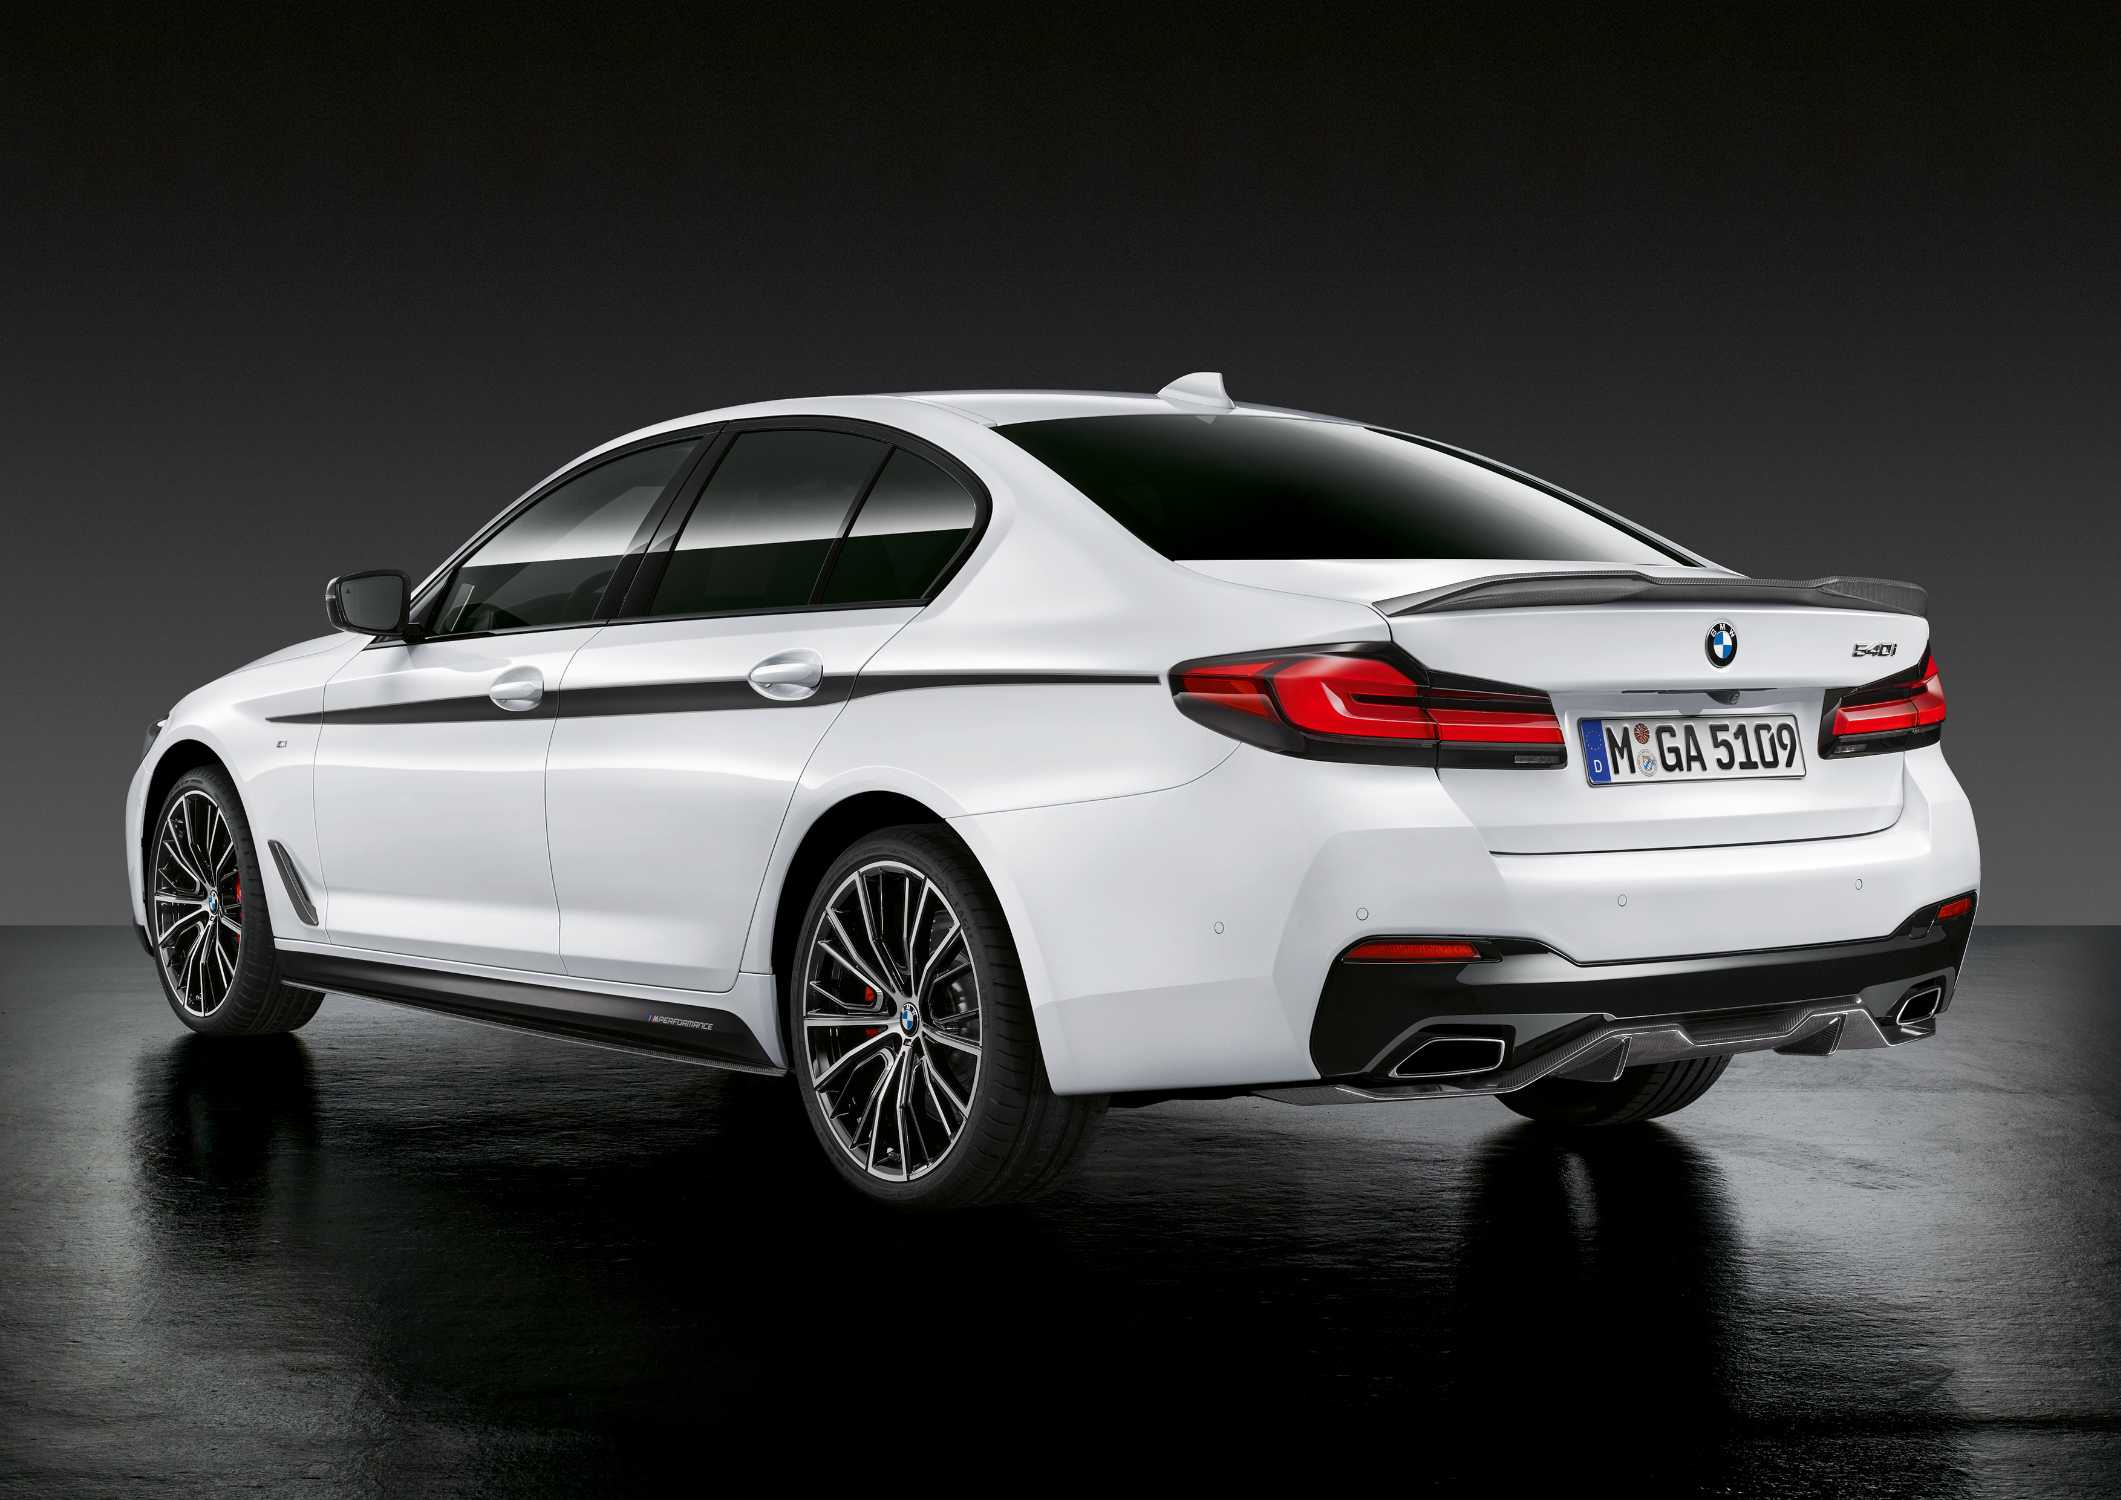 The new BMW 5 Series Sedan, M Performance Parts (05/2020)